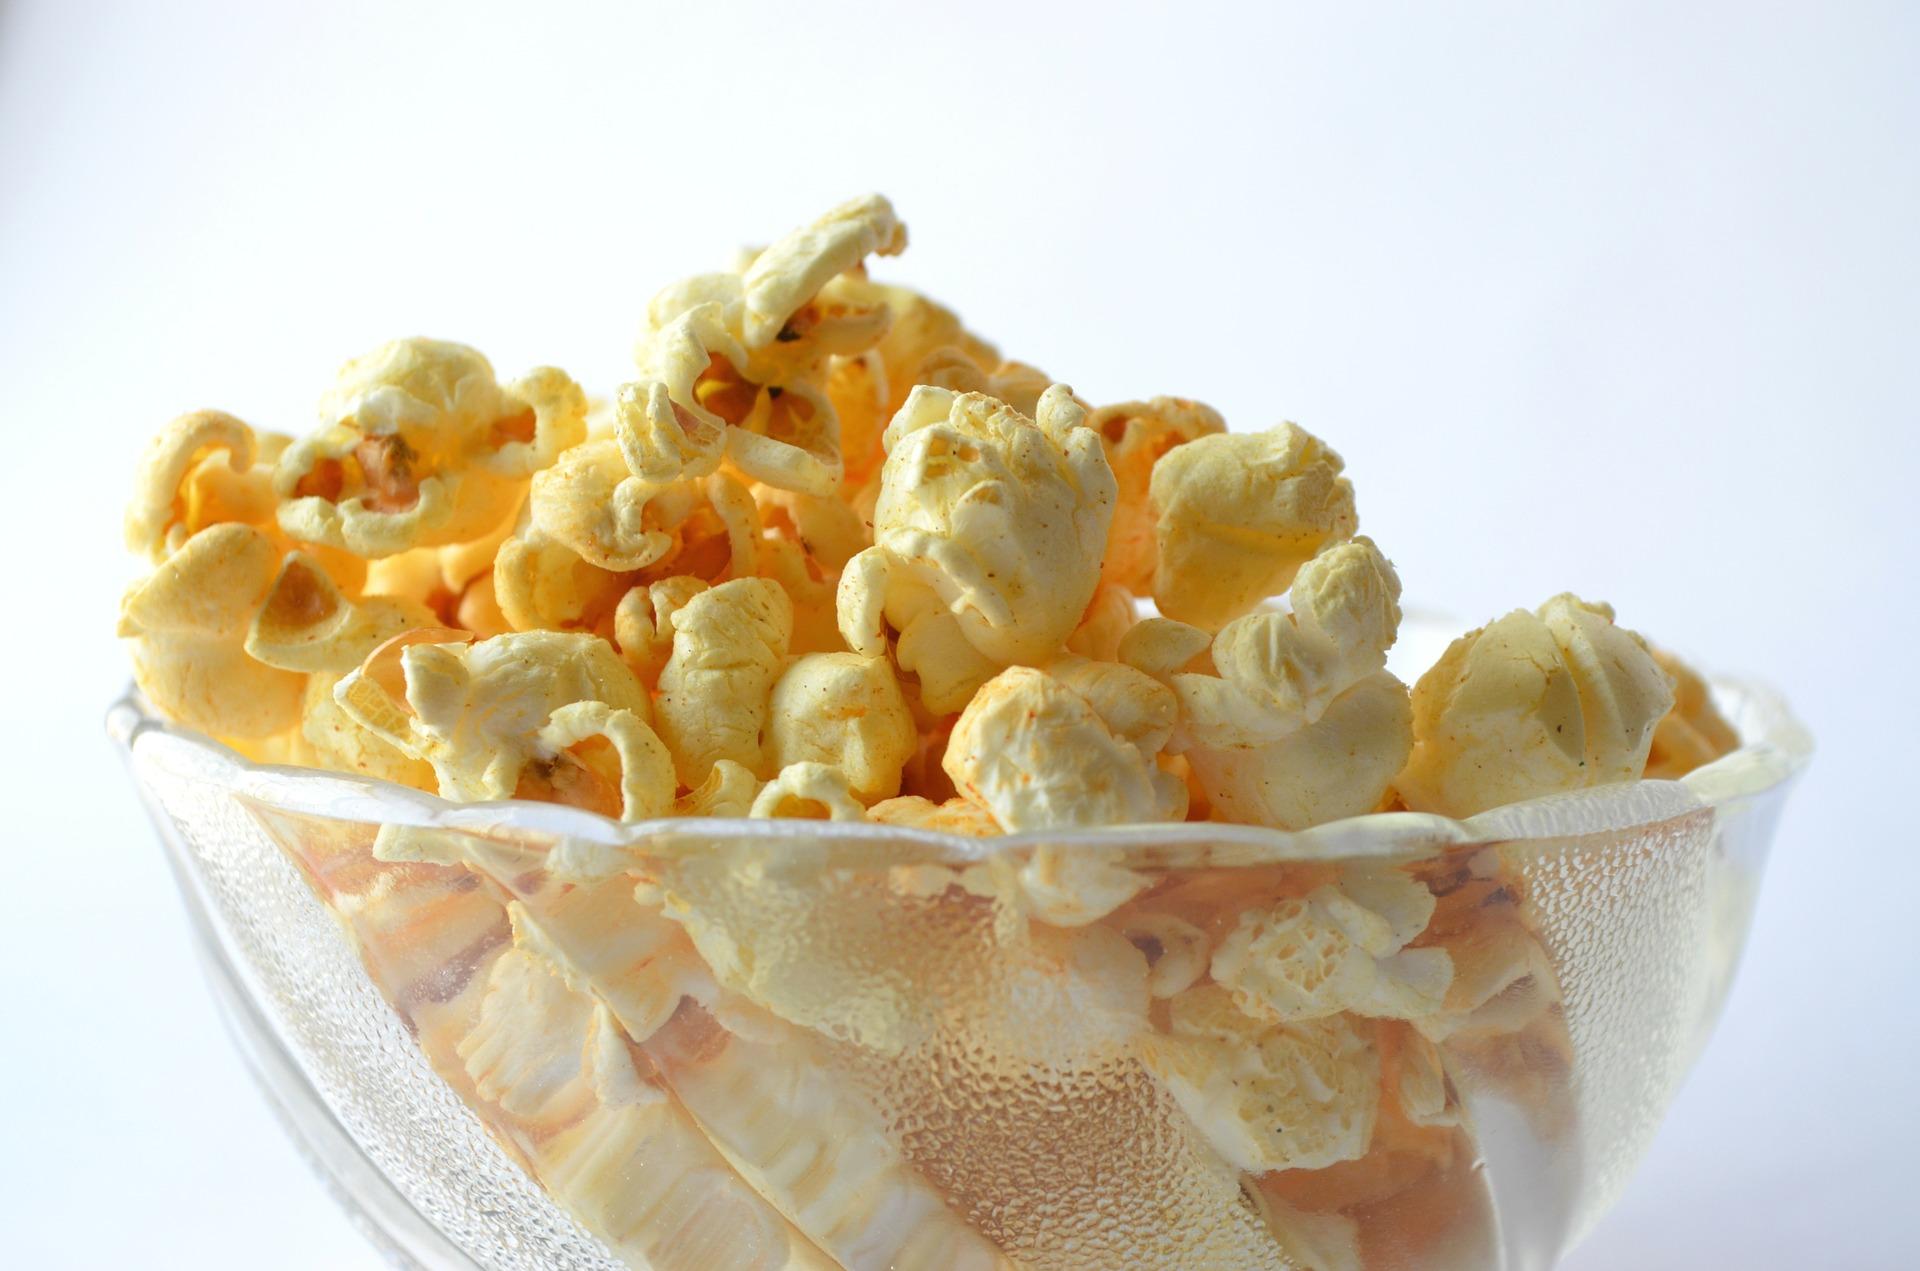 Palomitas de maíz: ¿son buenas? ¿cuántas calorías tienen?